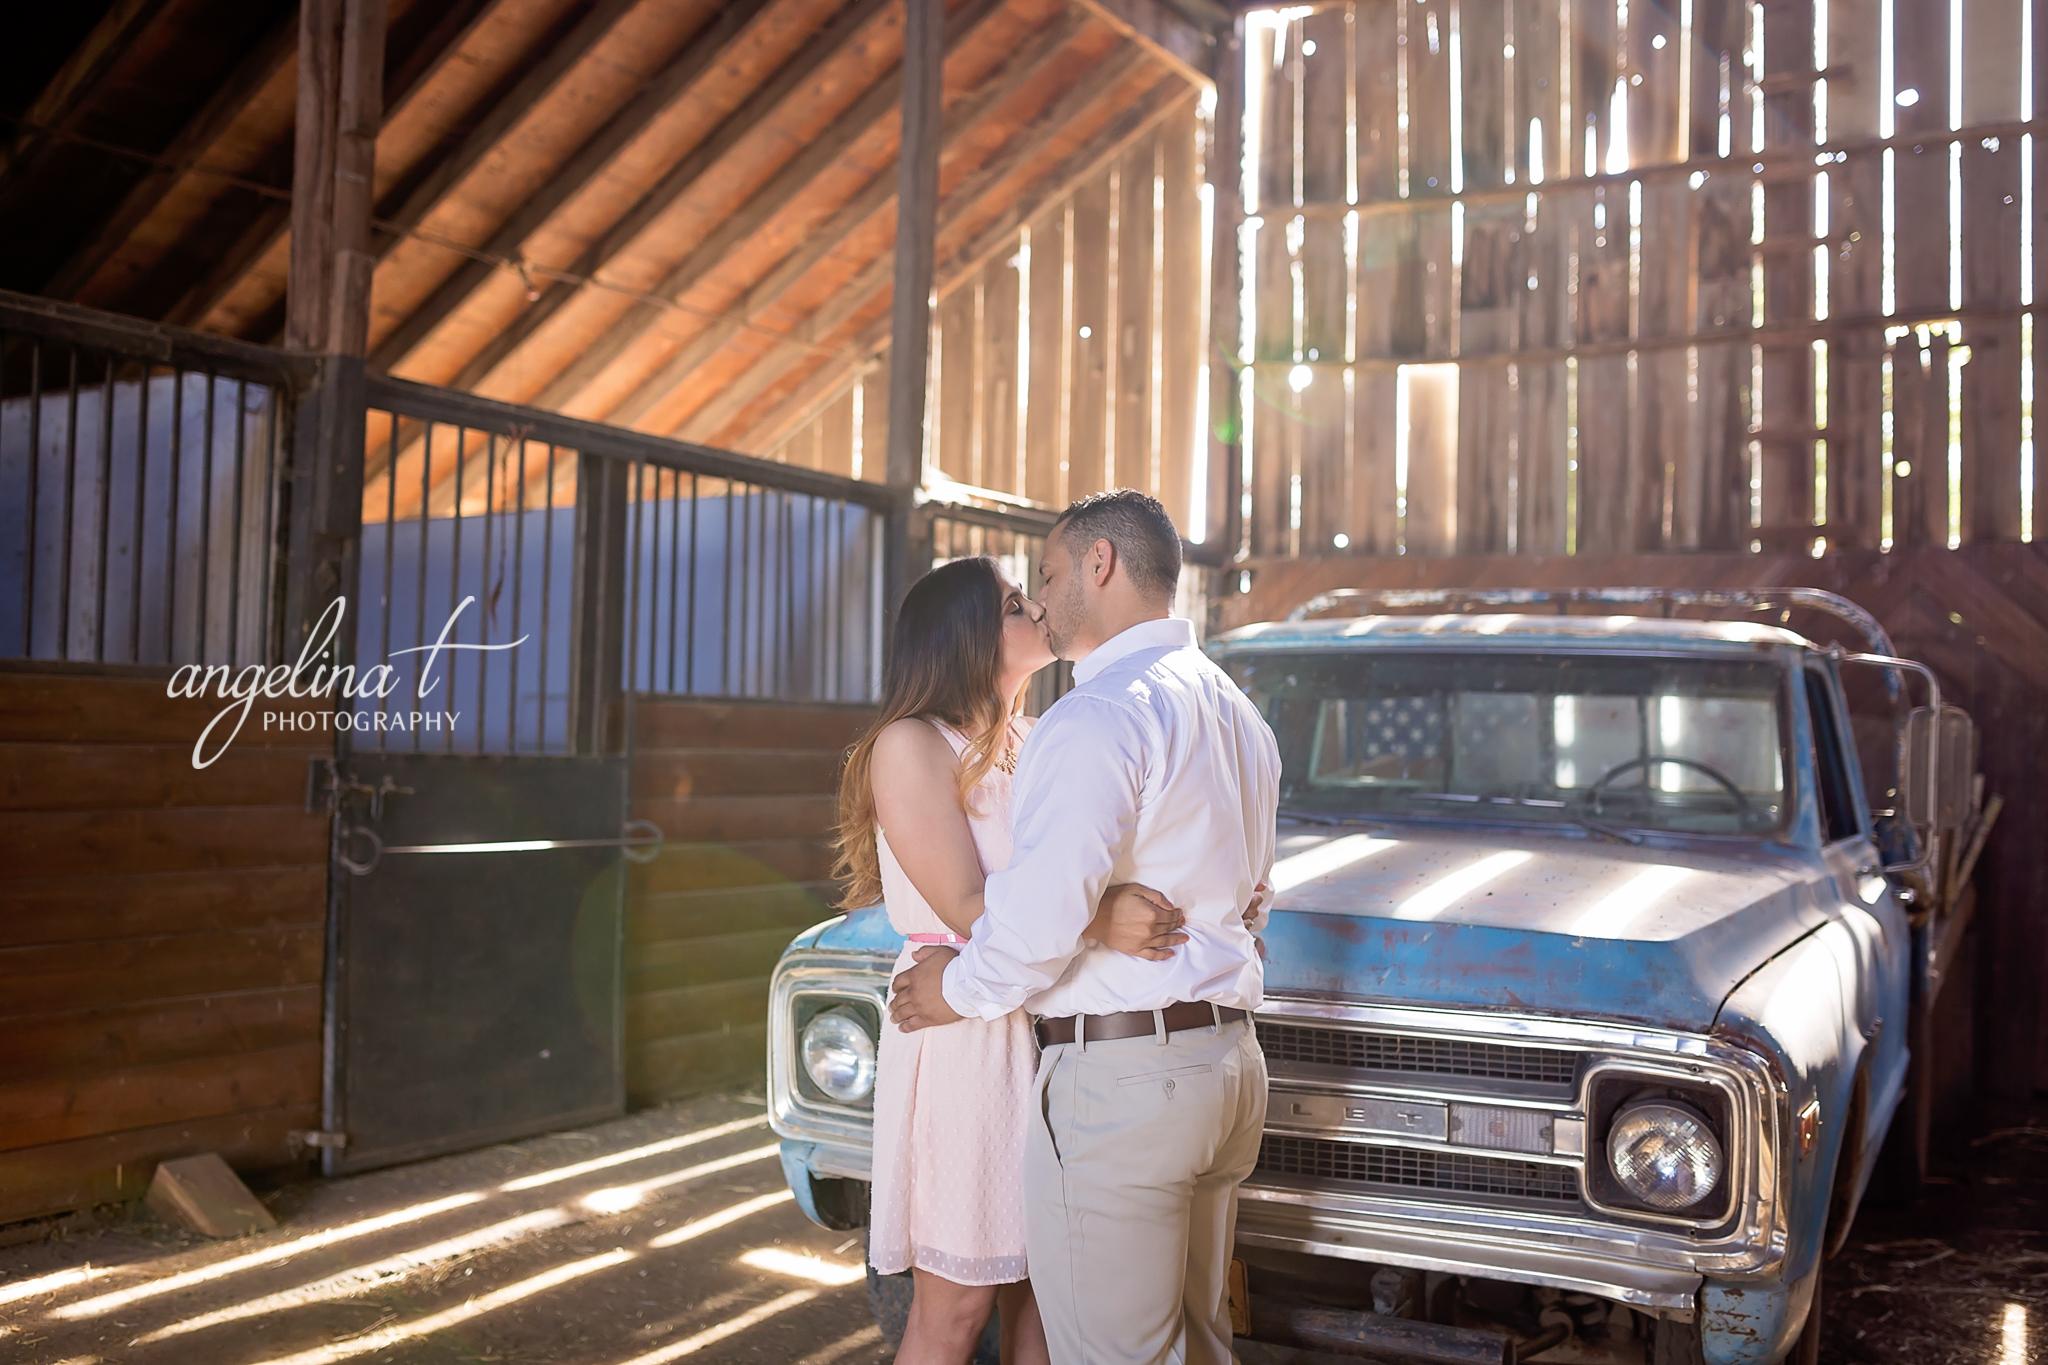 California West 12 Ranch Engagement-02.jpg